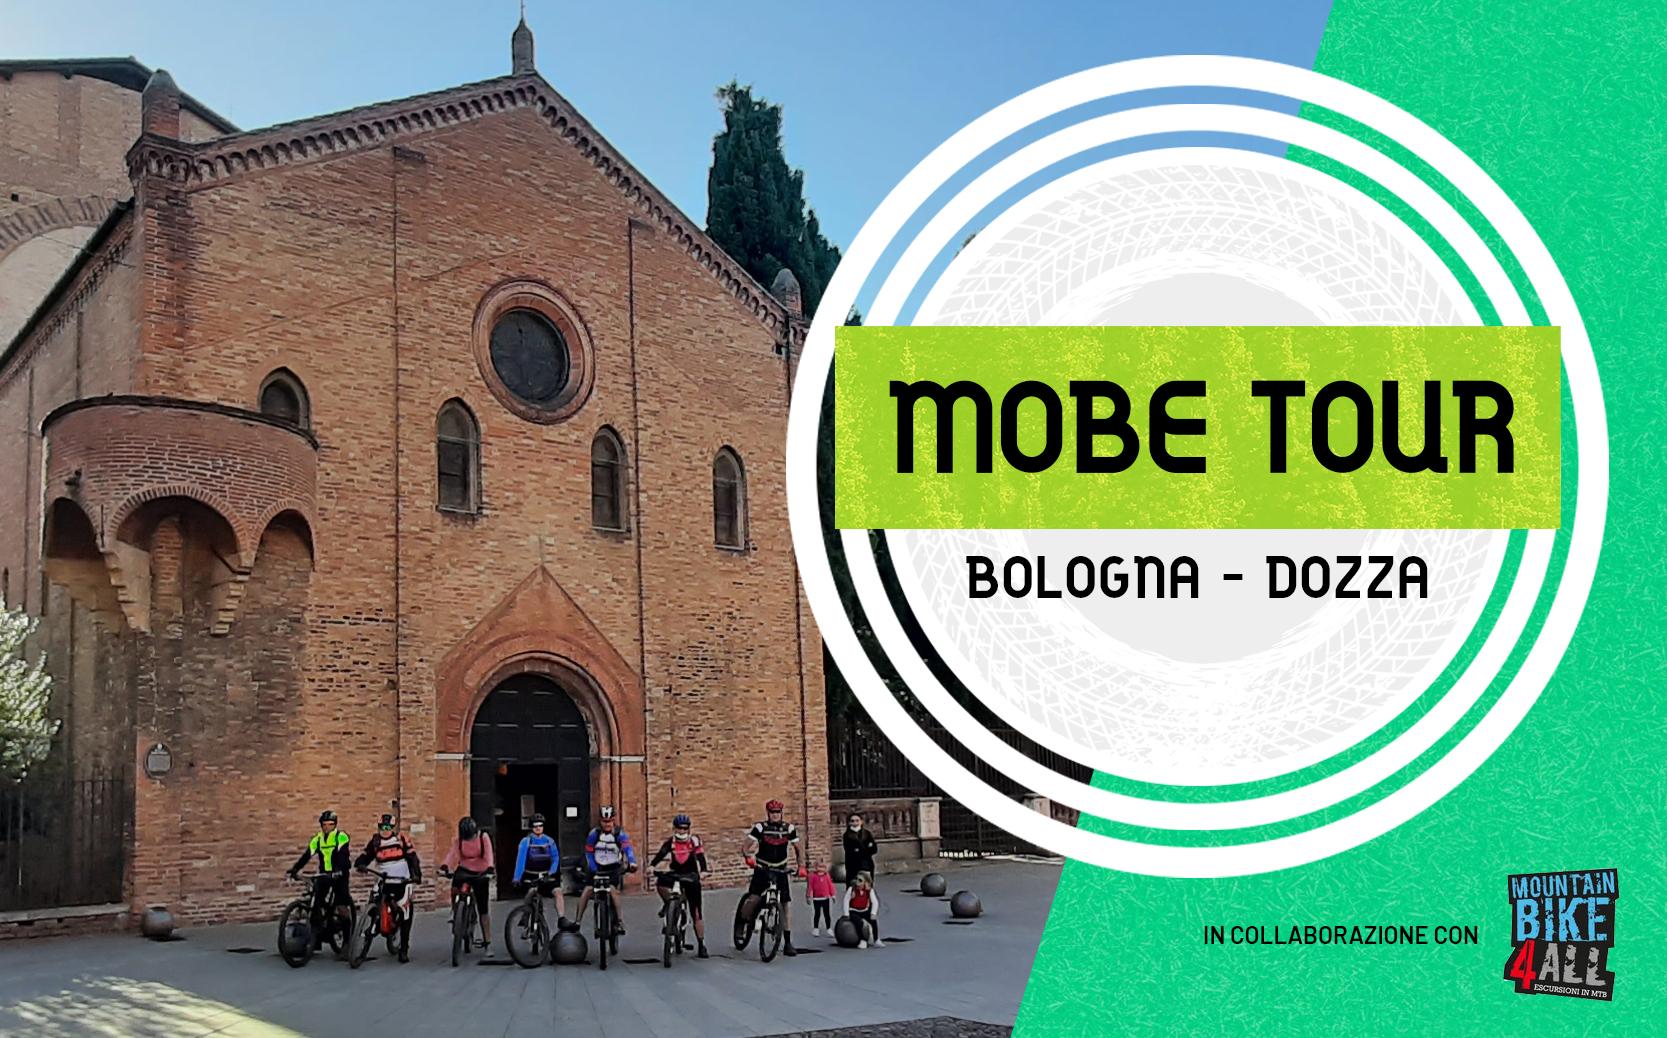 copertina mobe tour emtb bici elettrica bologna dozza